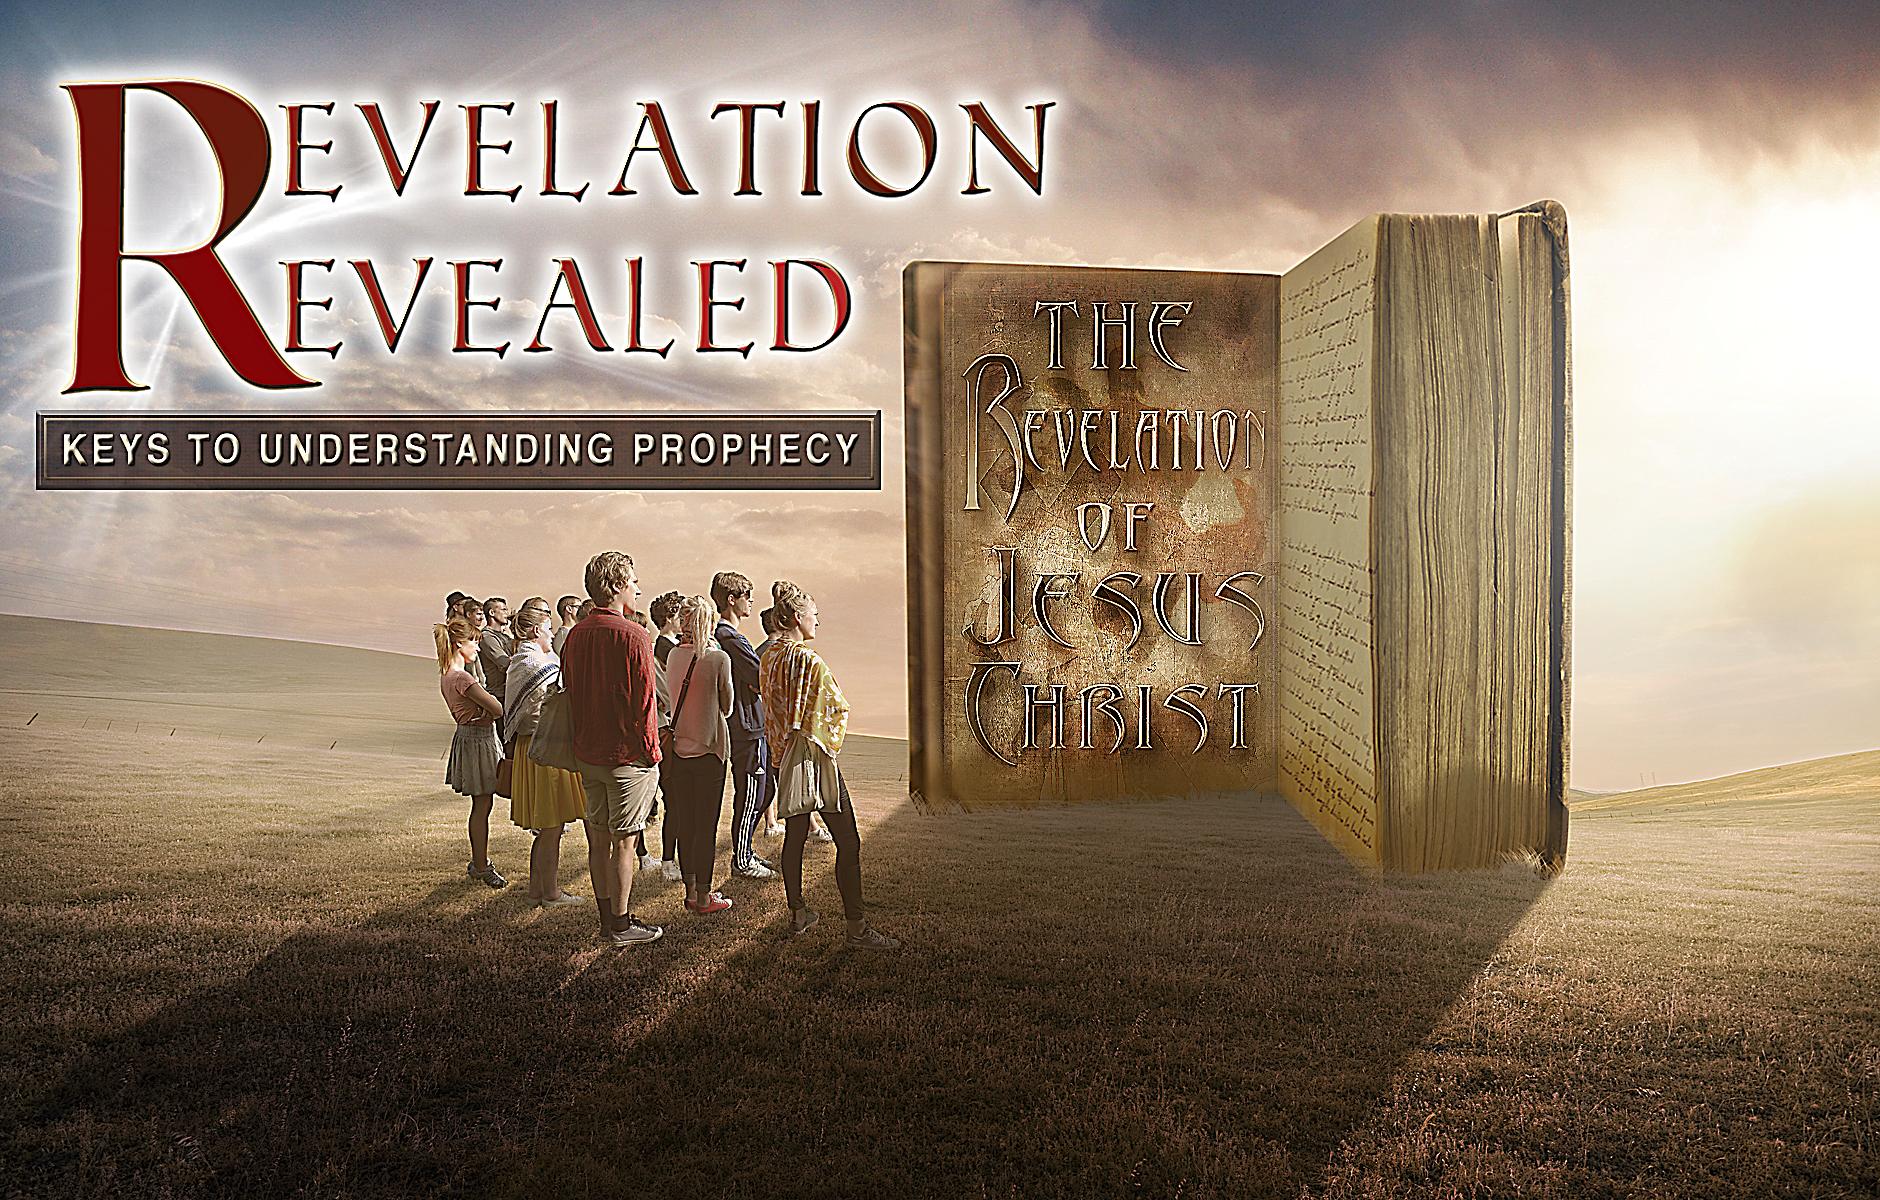 Revelation Revealed Series [Introduction]